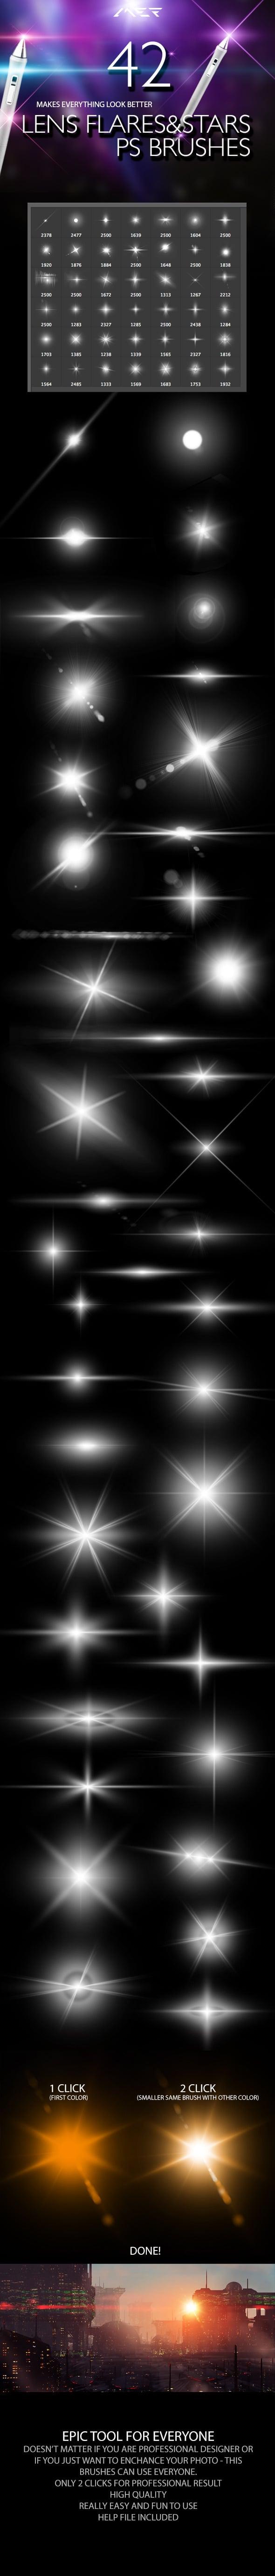 Lens Flares & Stars Photoshop Brushes prev